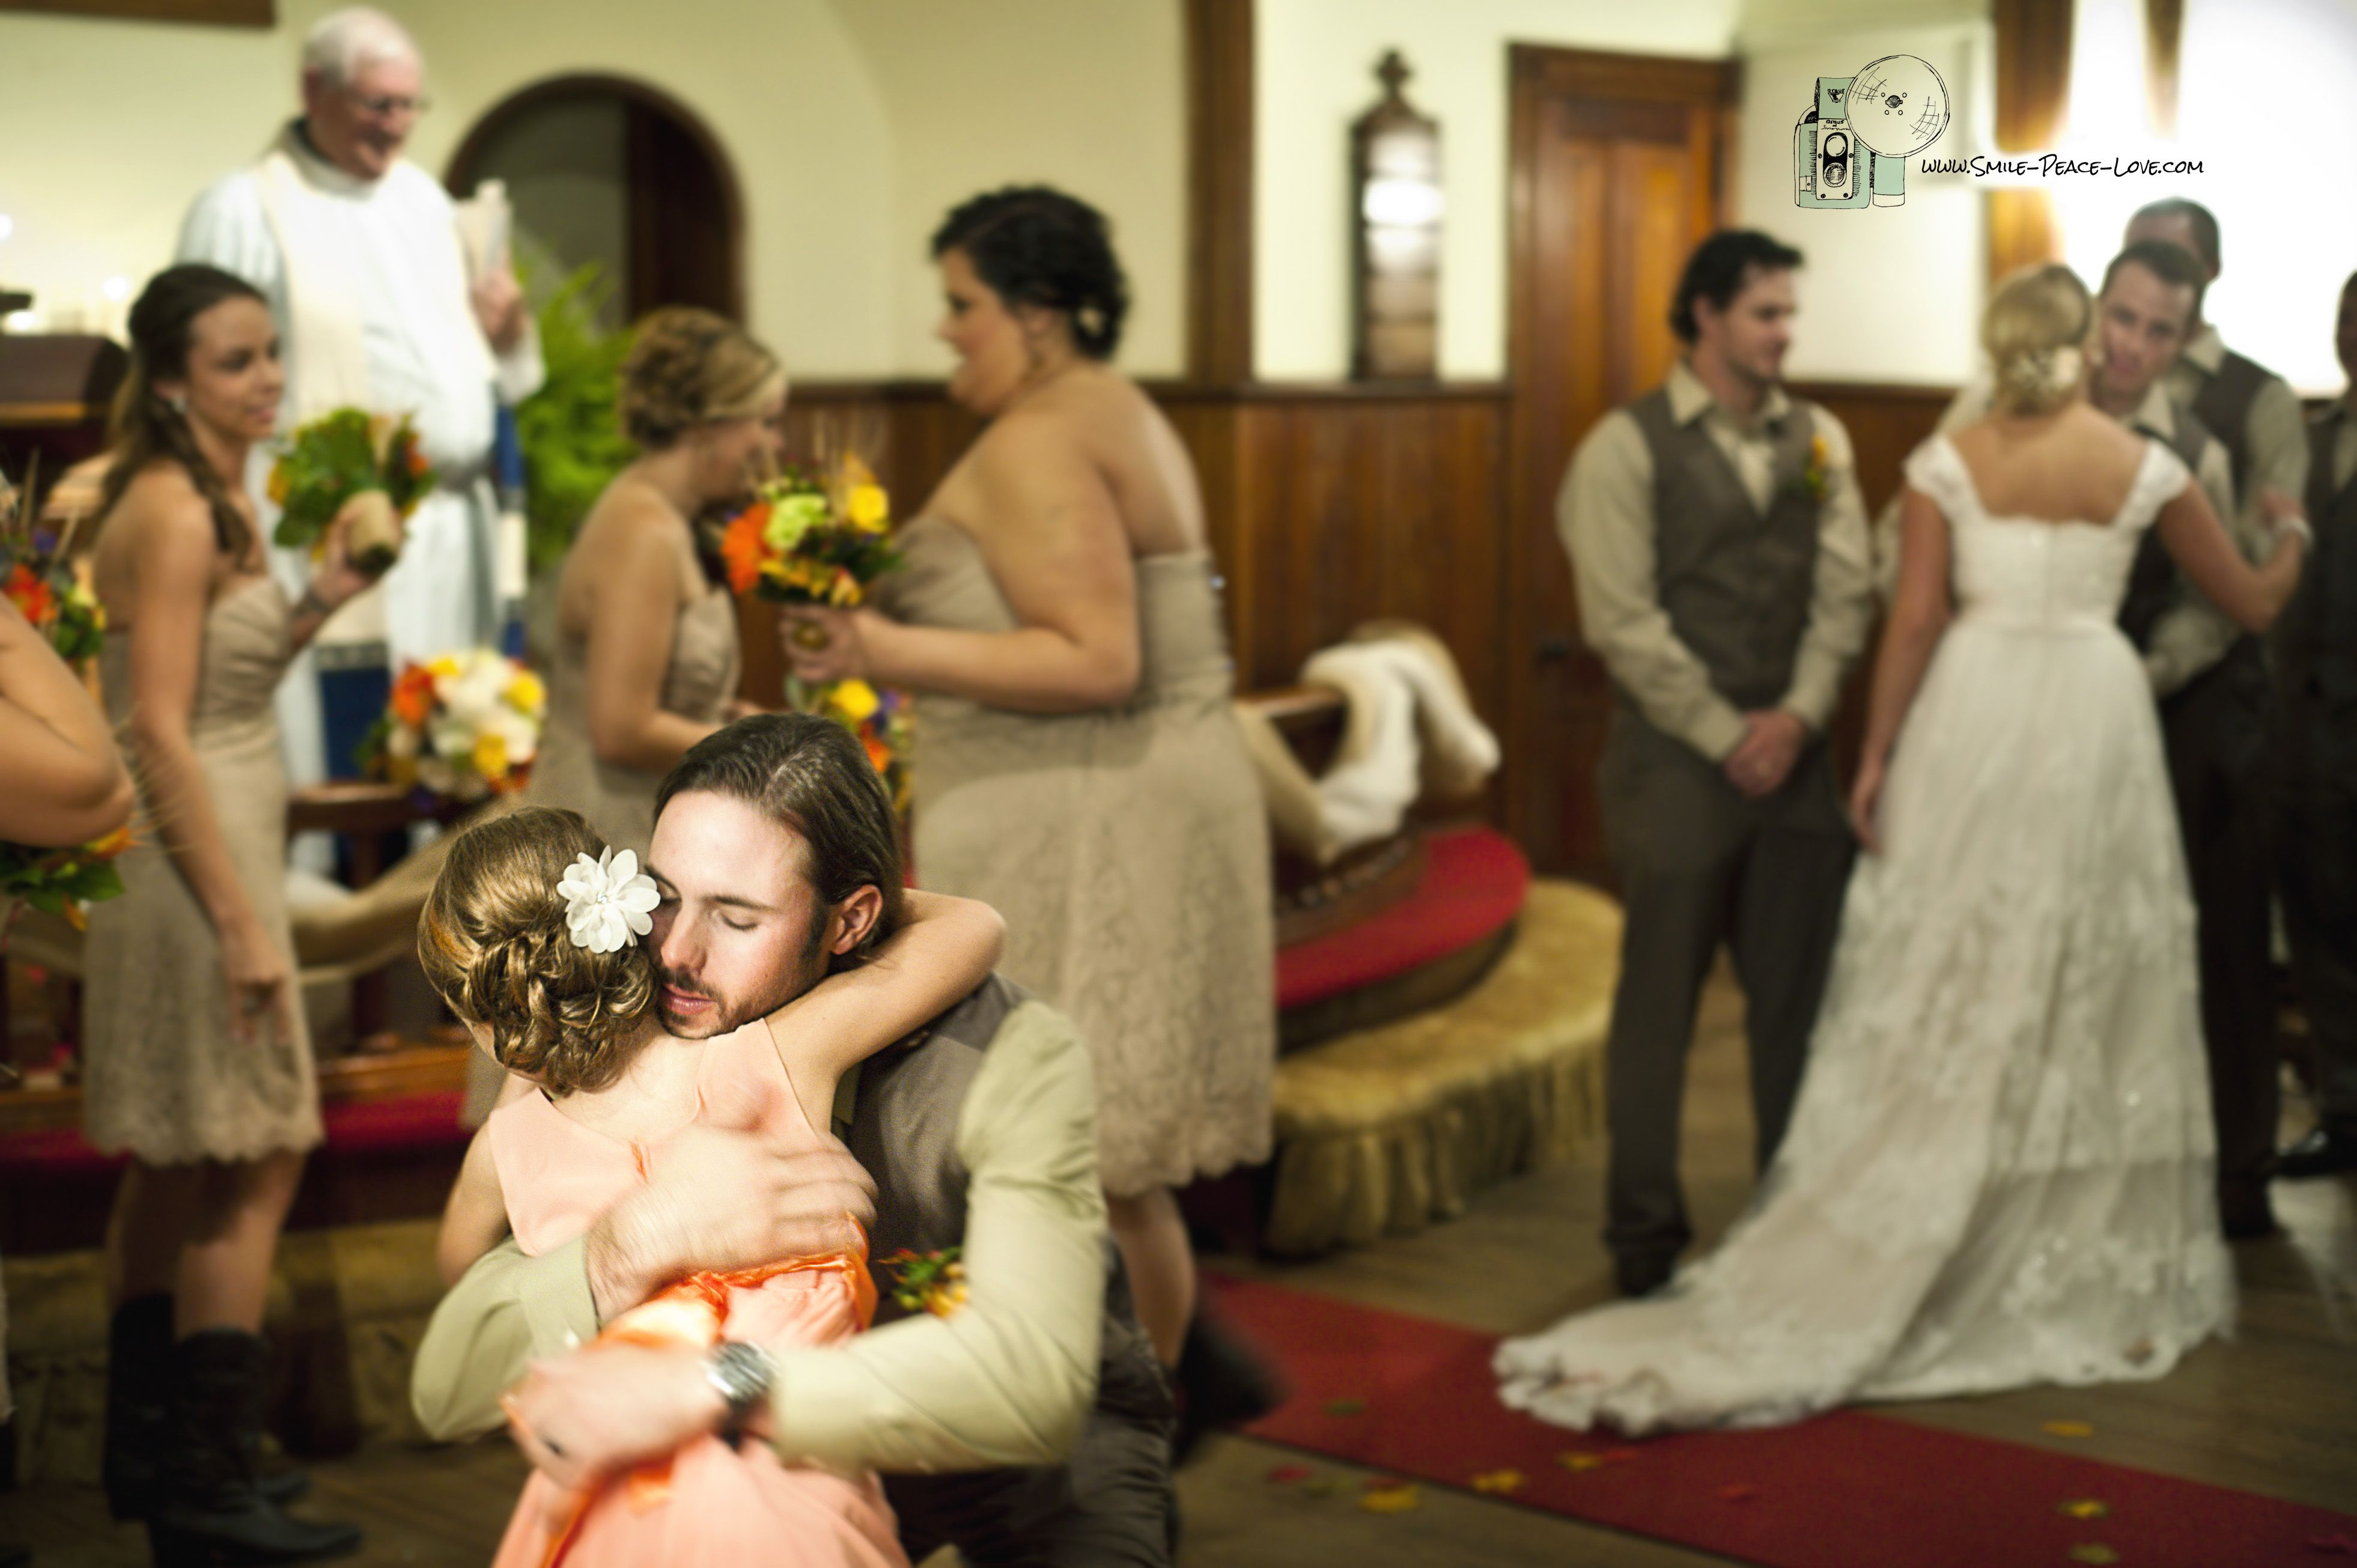 Brian & Sherri's Wedding   ©Jill Nobles - Smile Peace Love Photography 2012